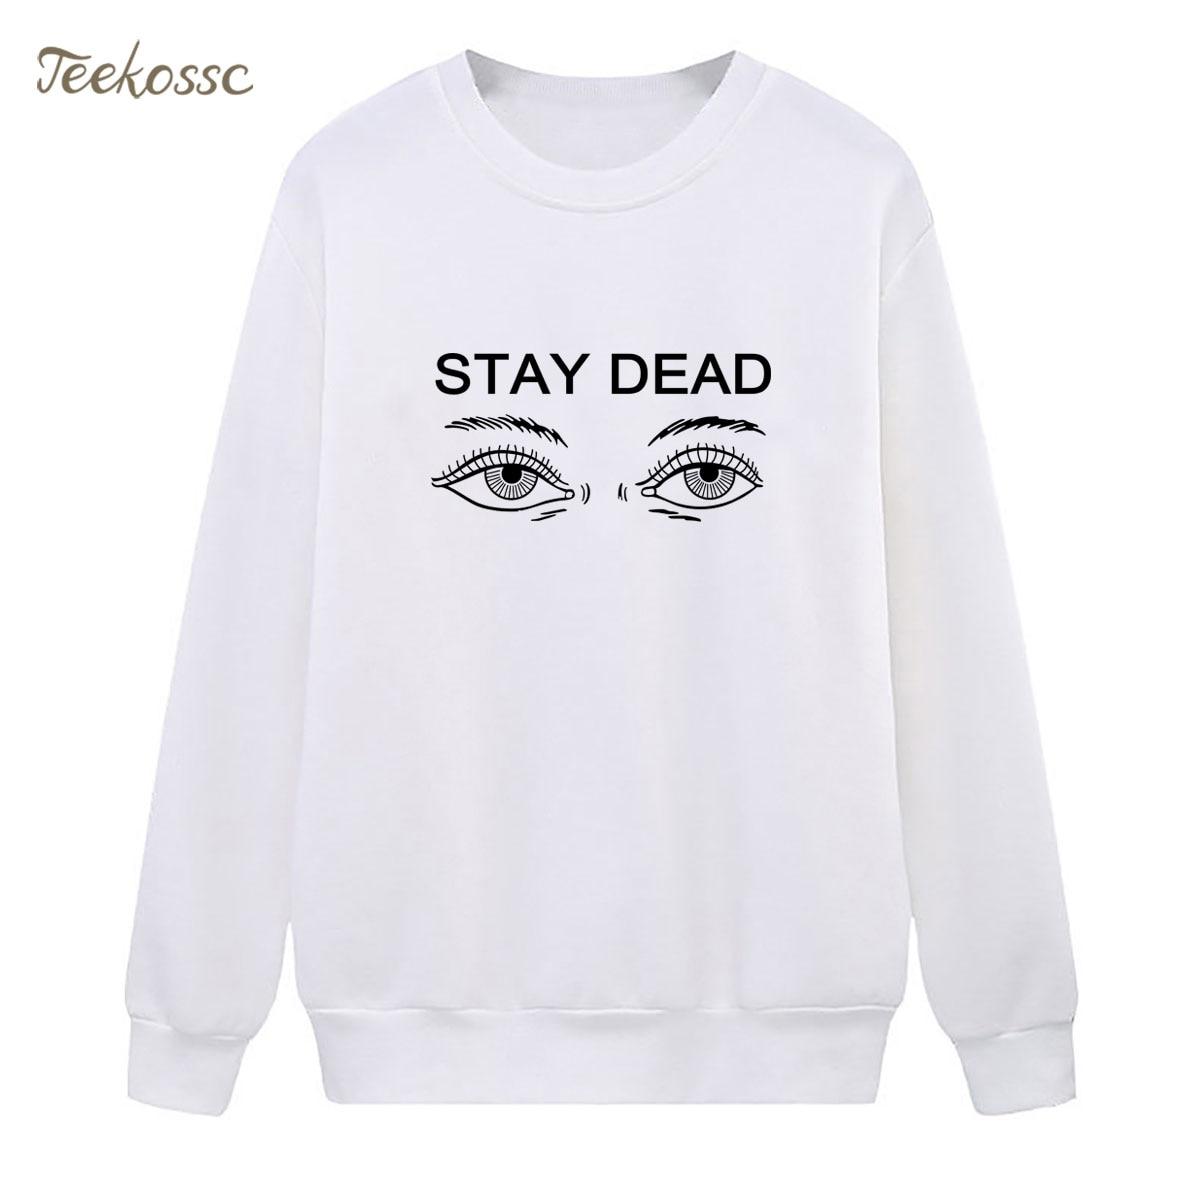 Say Dead Sweatshirt Hip Hop Hoodie 2018 Fashion Winter Autumn Women Lasdies Pullover Fleece Warm Loose Streetwear Brand Clothing